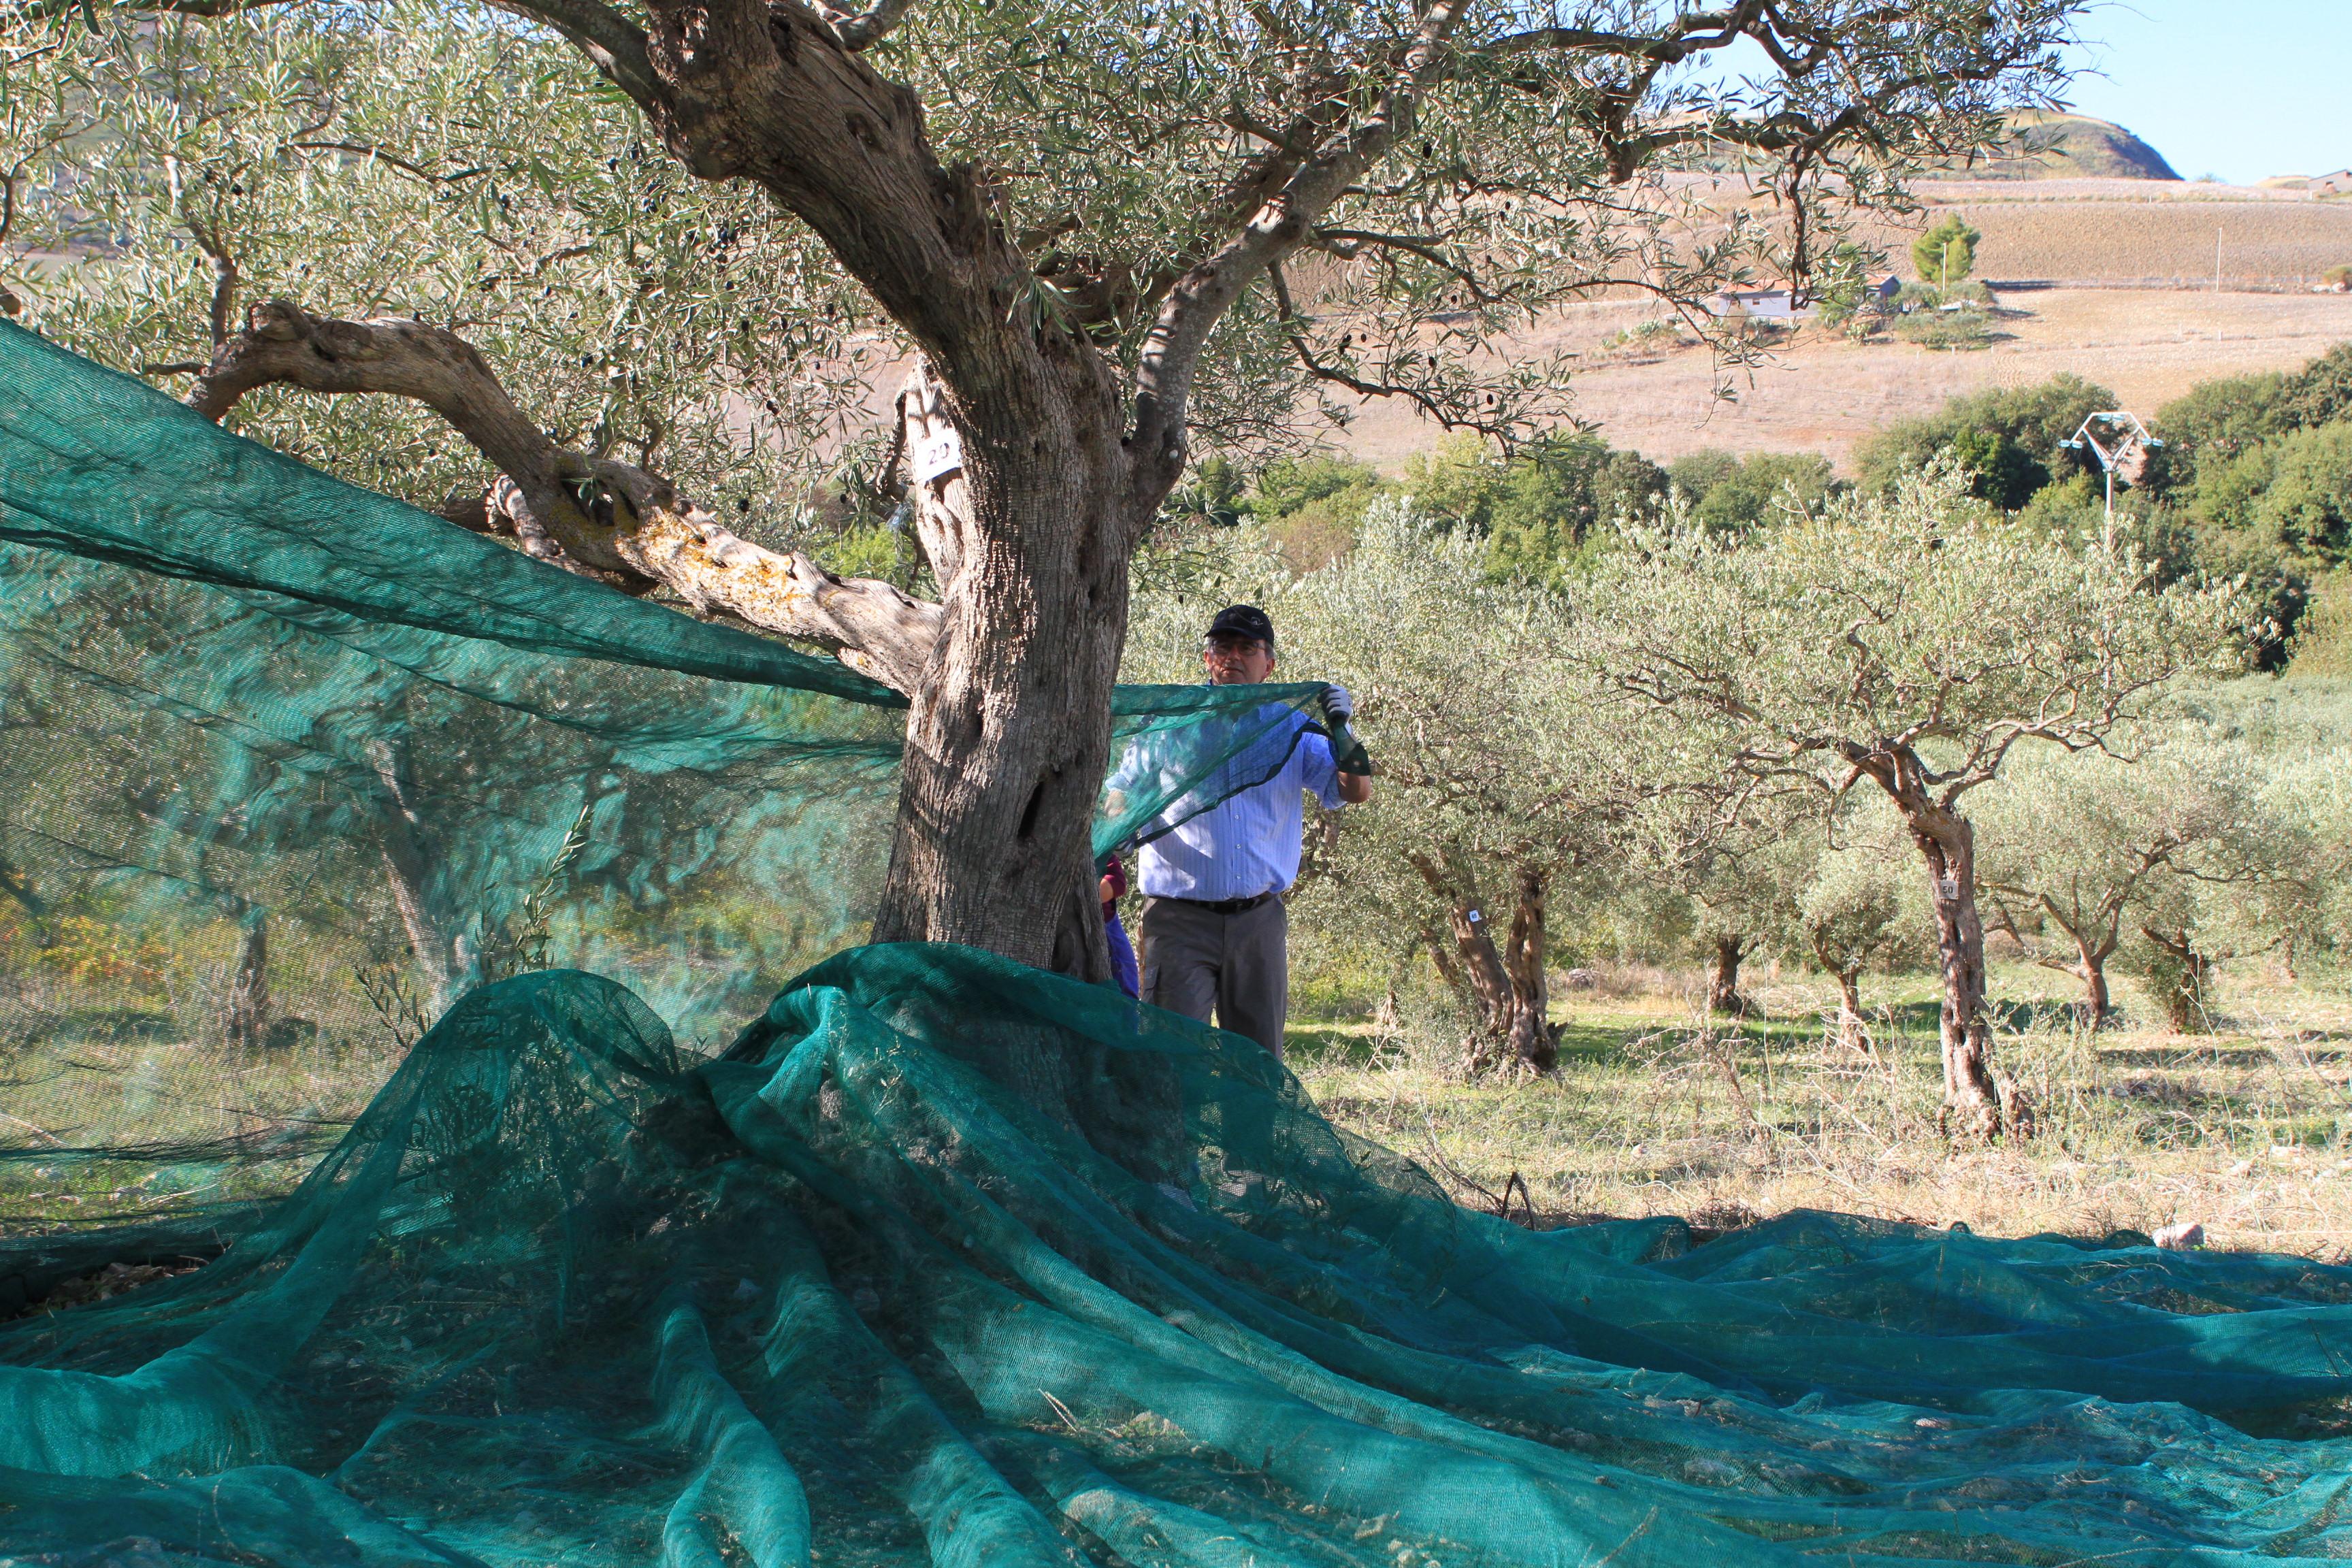 Olivenöl, Ernte, Bisaquino, Sizilien, Luigi Bellina, Olivenbaum, Meer, Strand